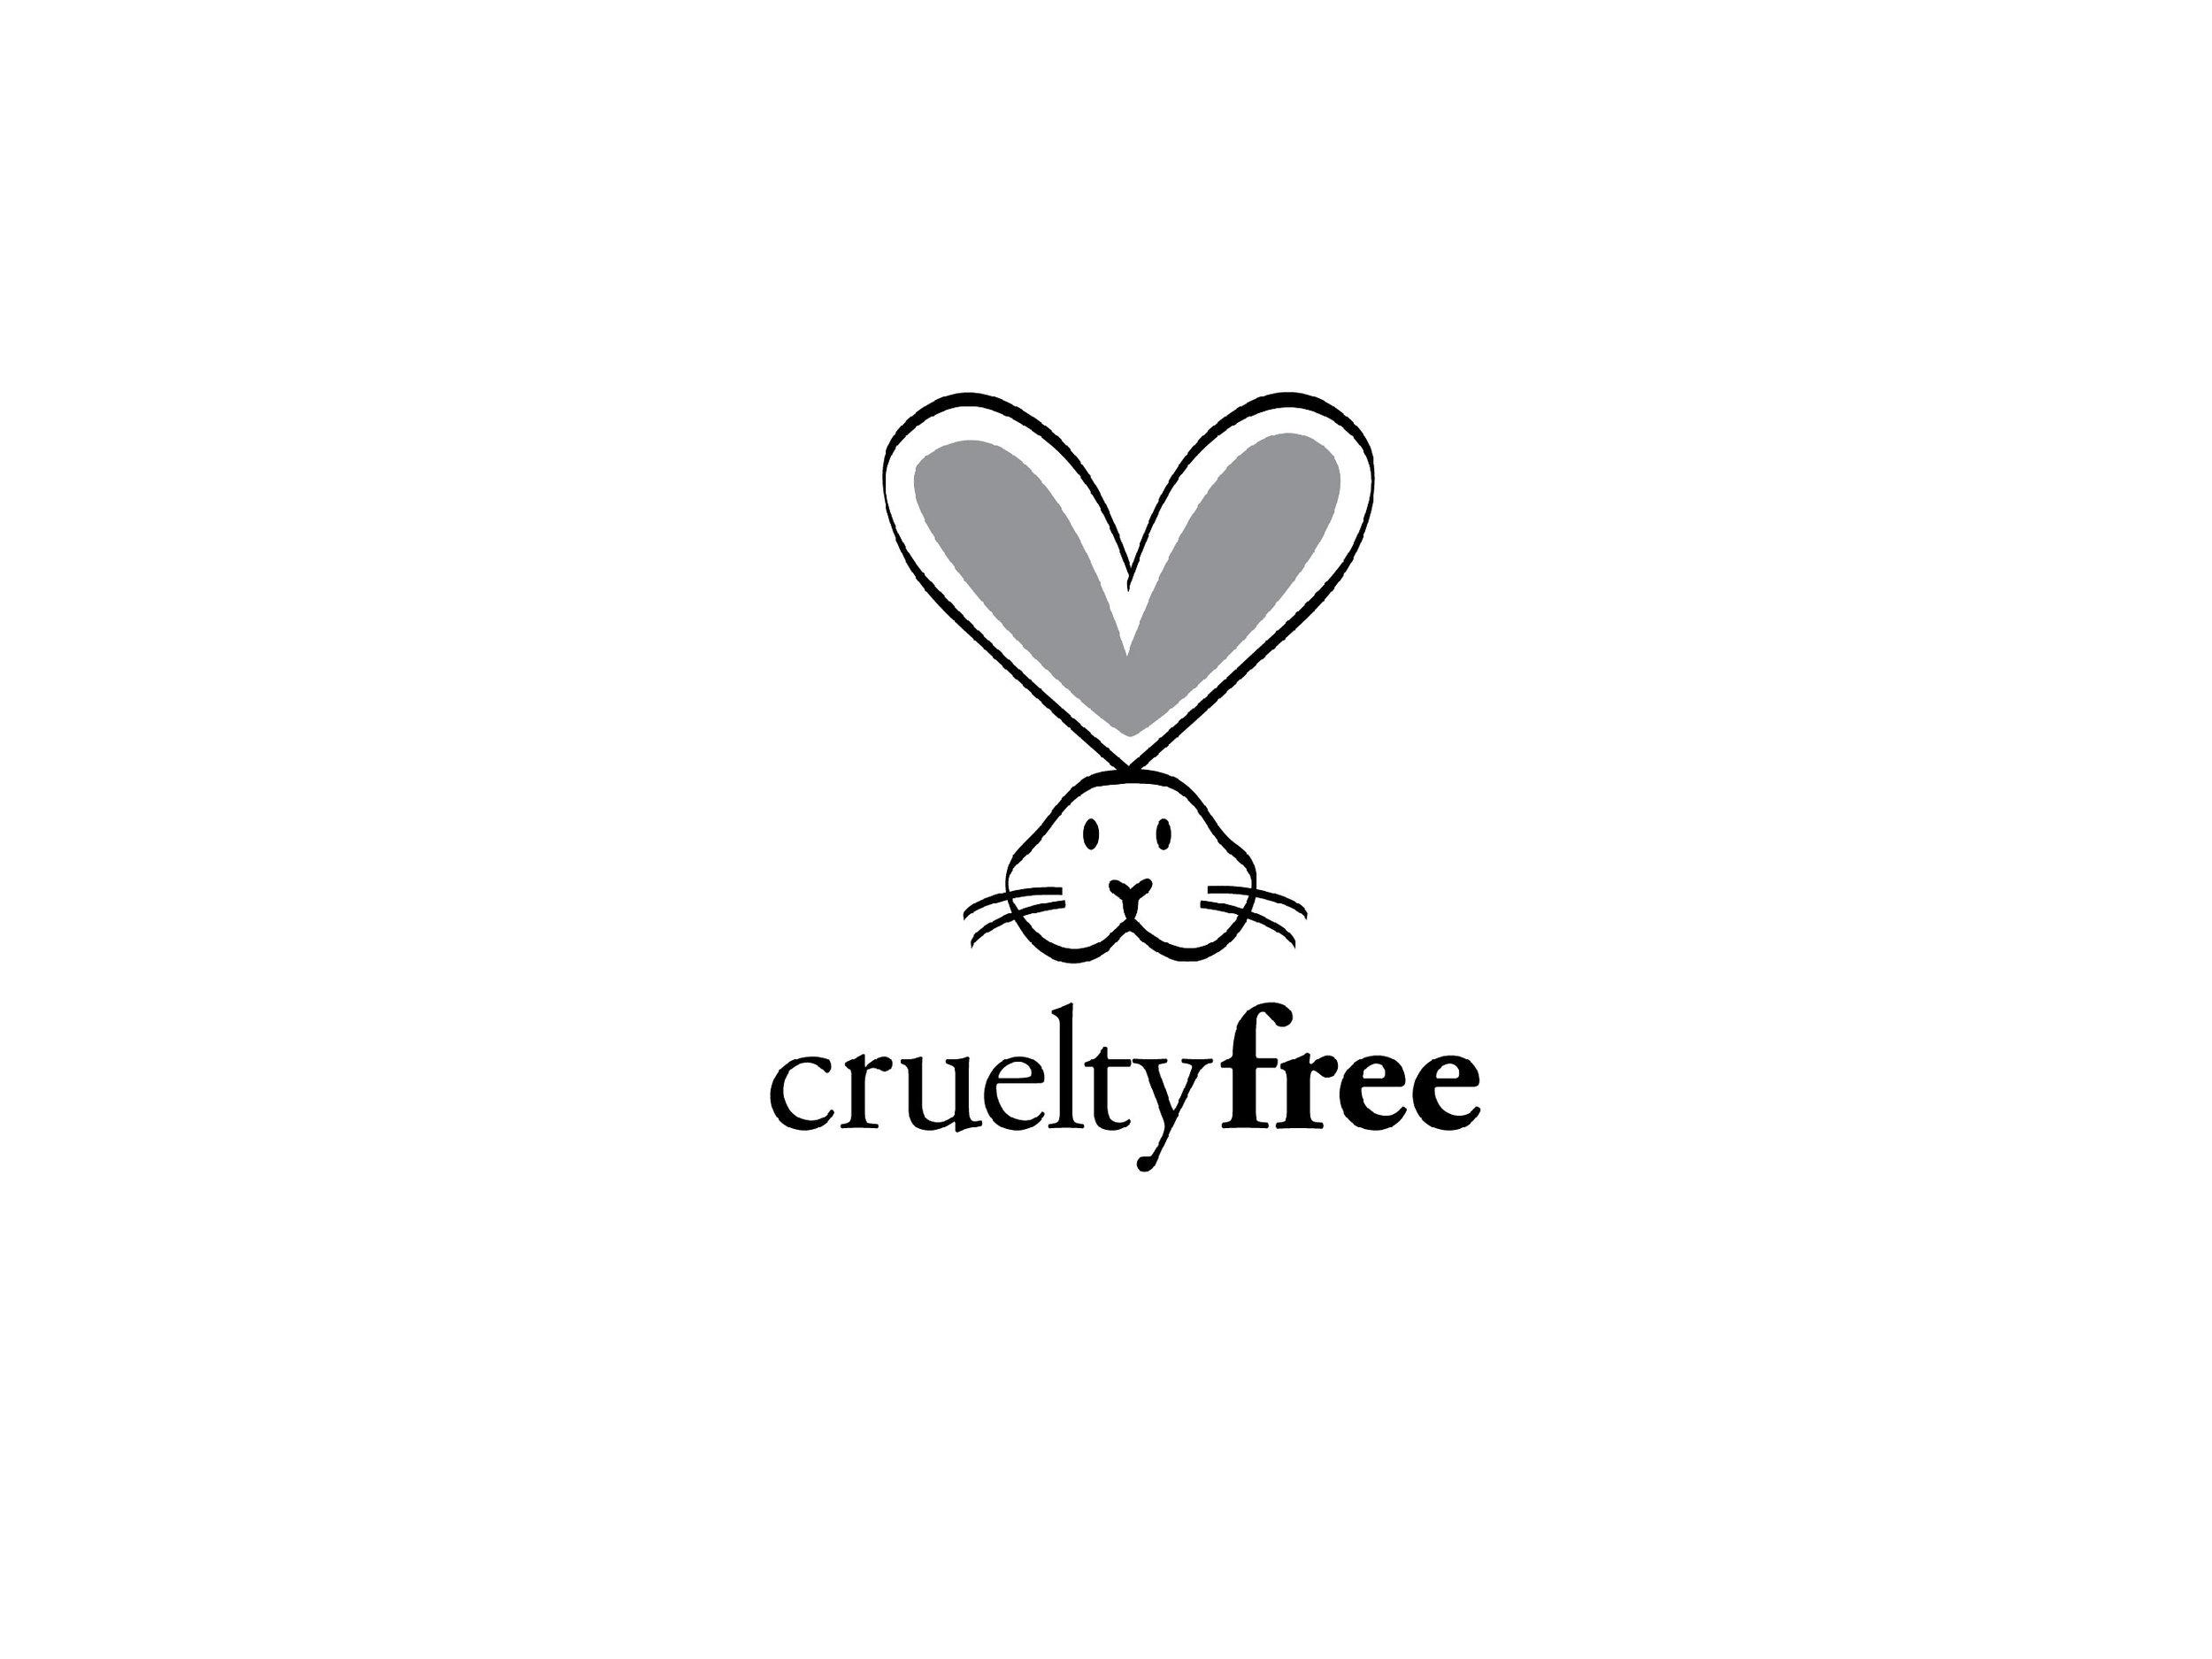 dprskn-claymask-crueltyfree-icon-01.jpg